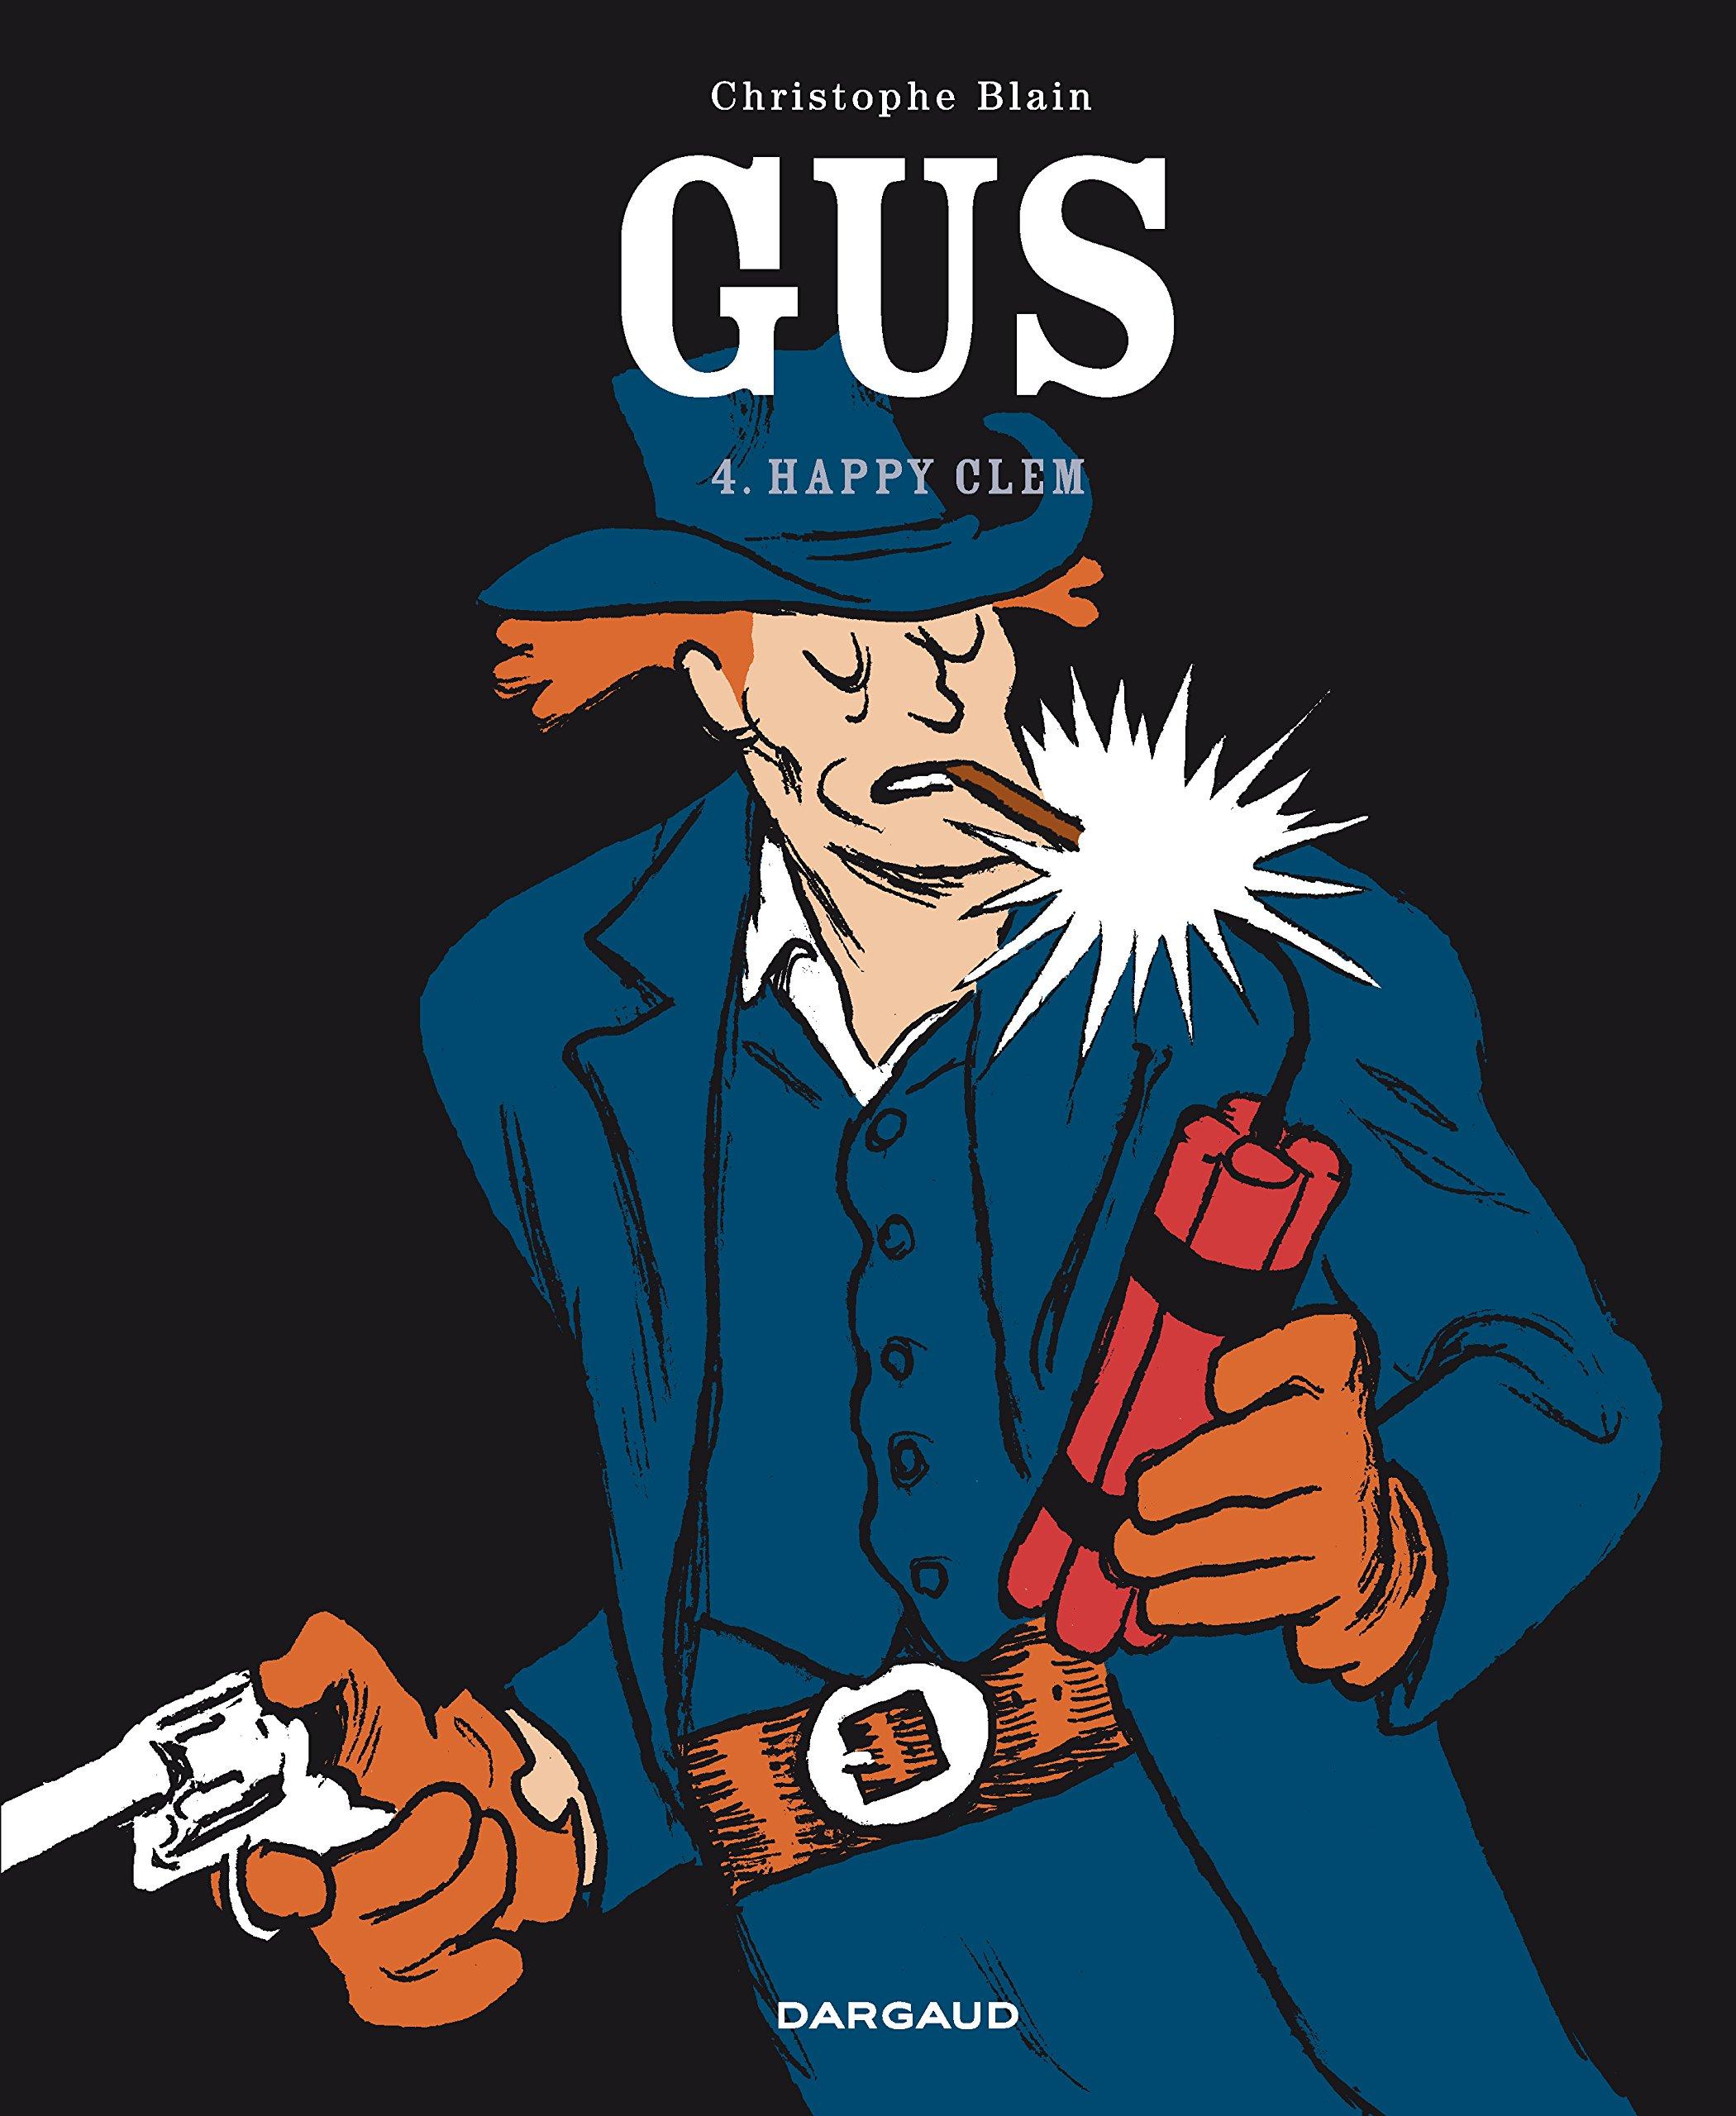 Gus - tome 4 - Happy Clem Album – 27 janvier 2017 Blain Christophe Gus - tome 4 - Happy Clem Dargaud 2205067761